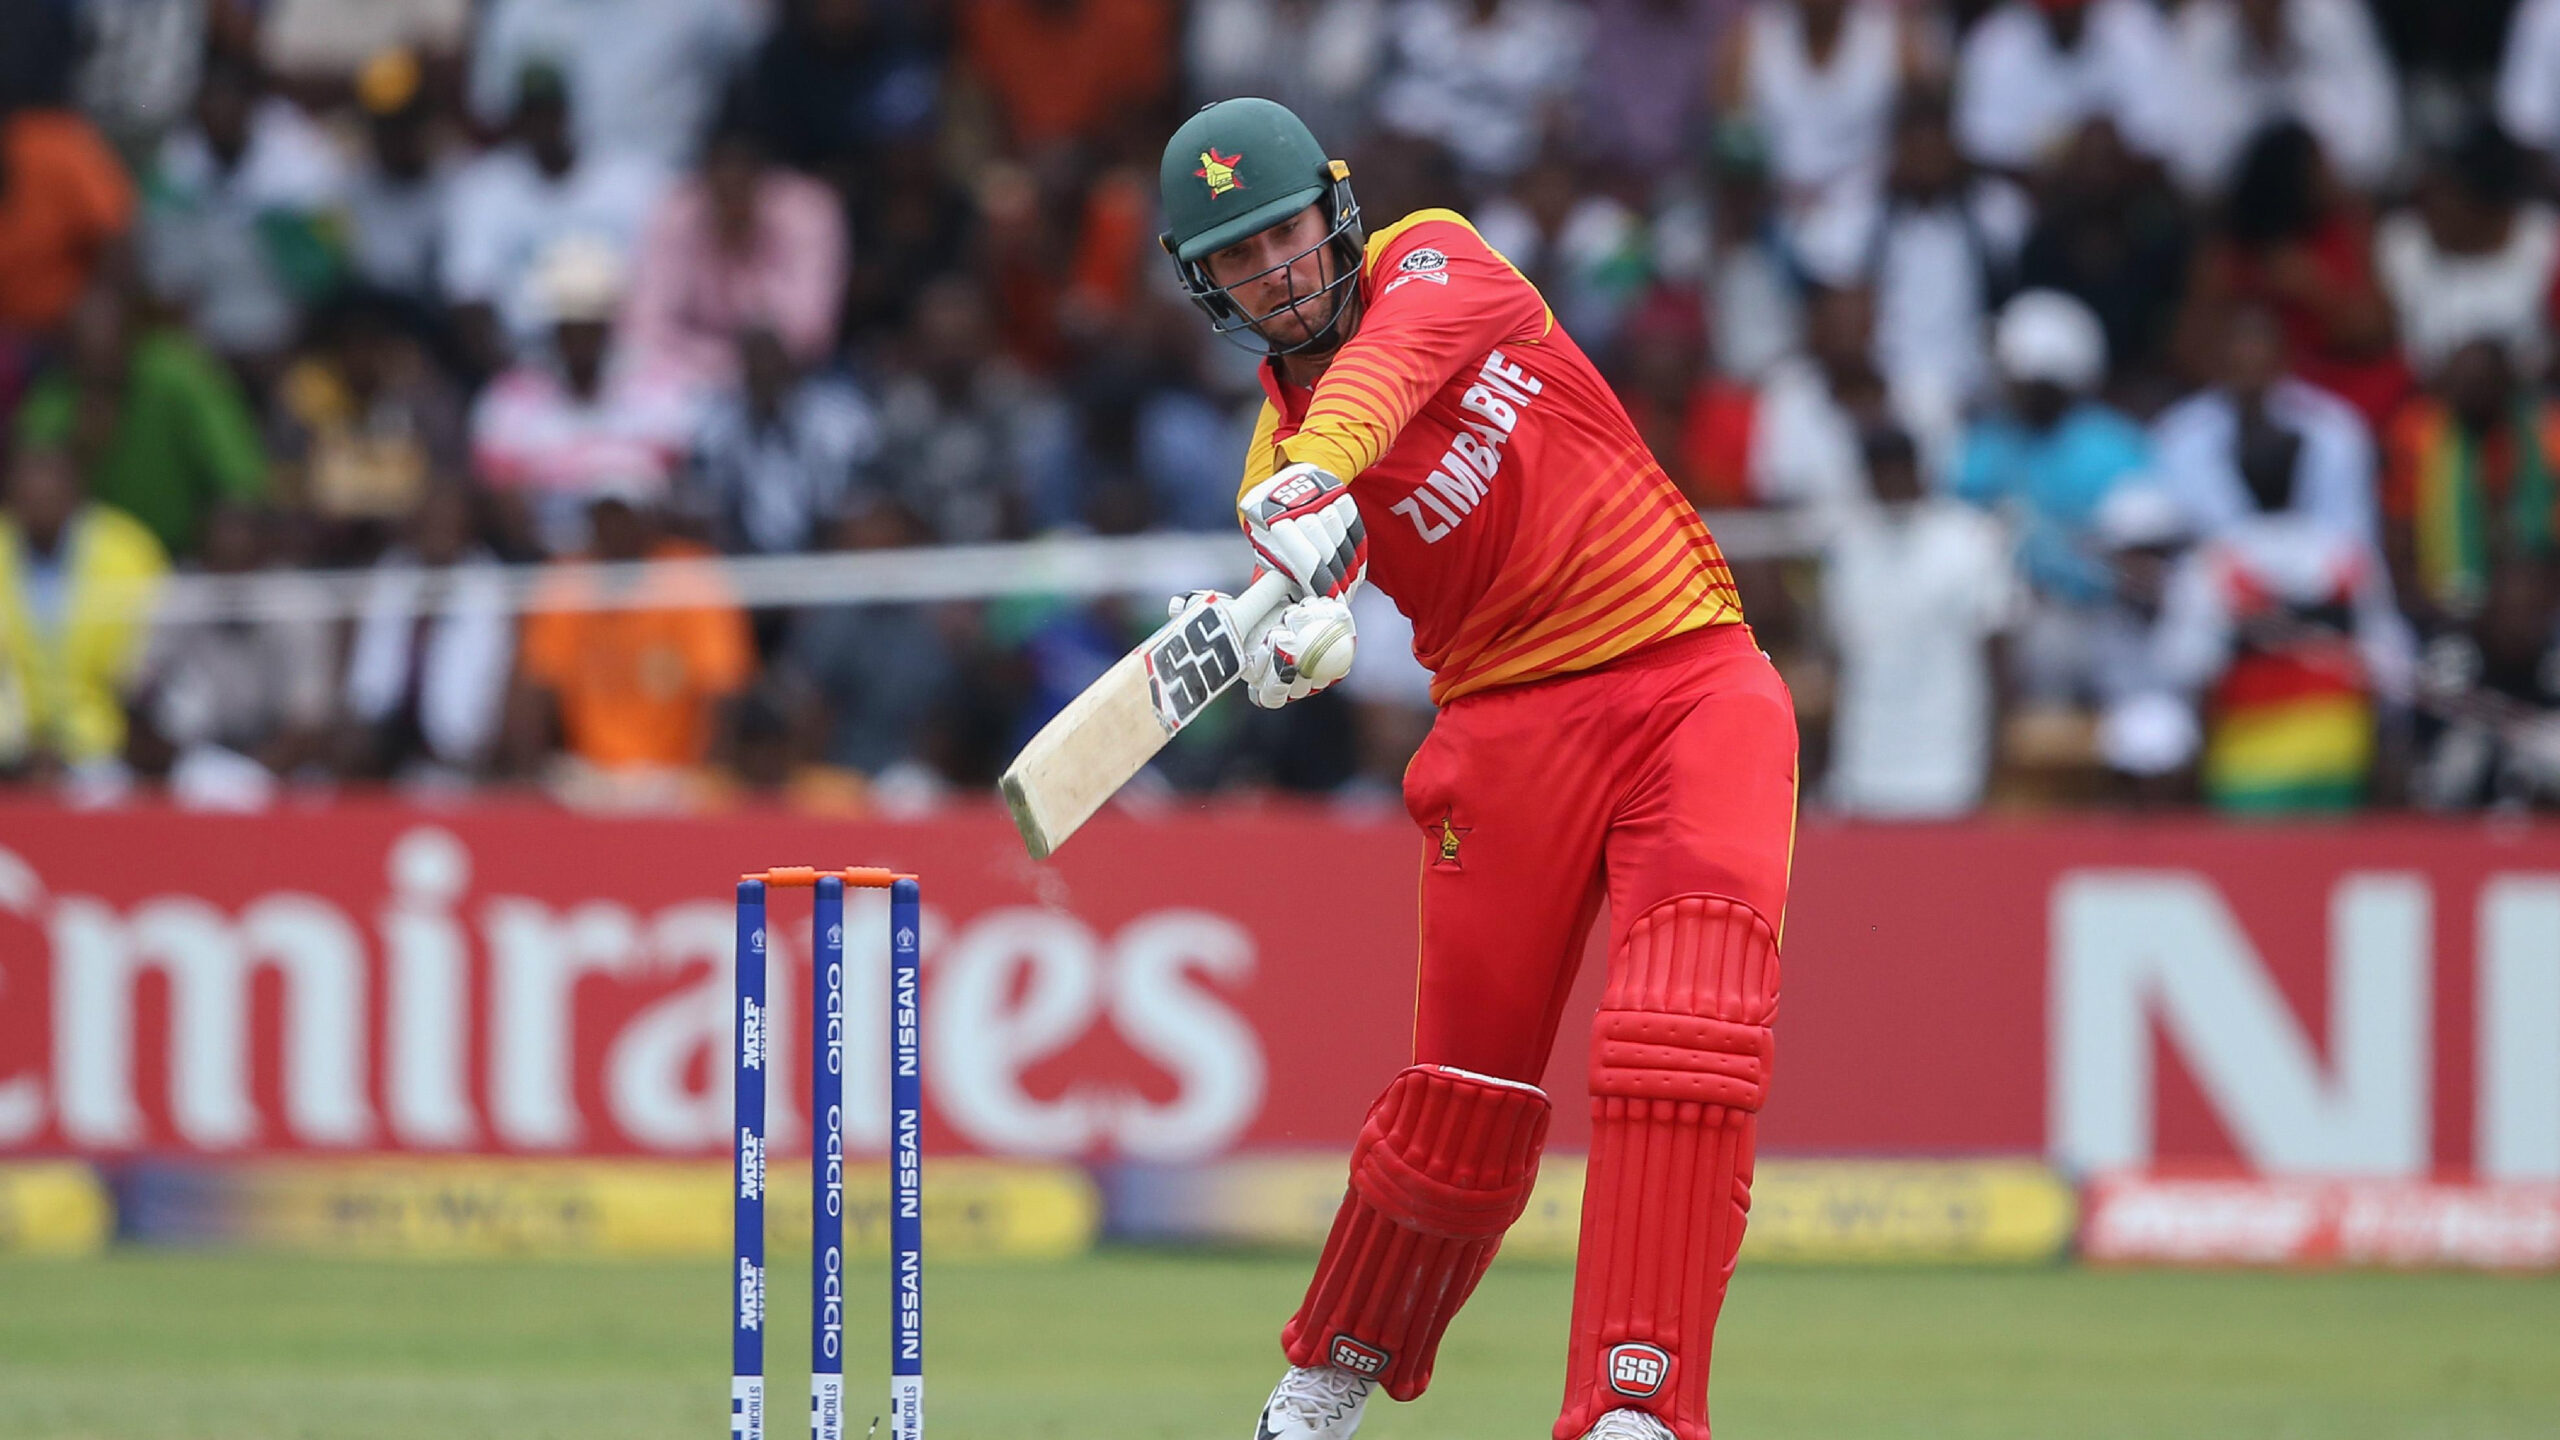 Zimbabwe recalls Taylor for series with Pakistan